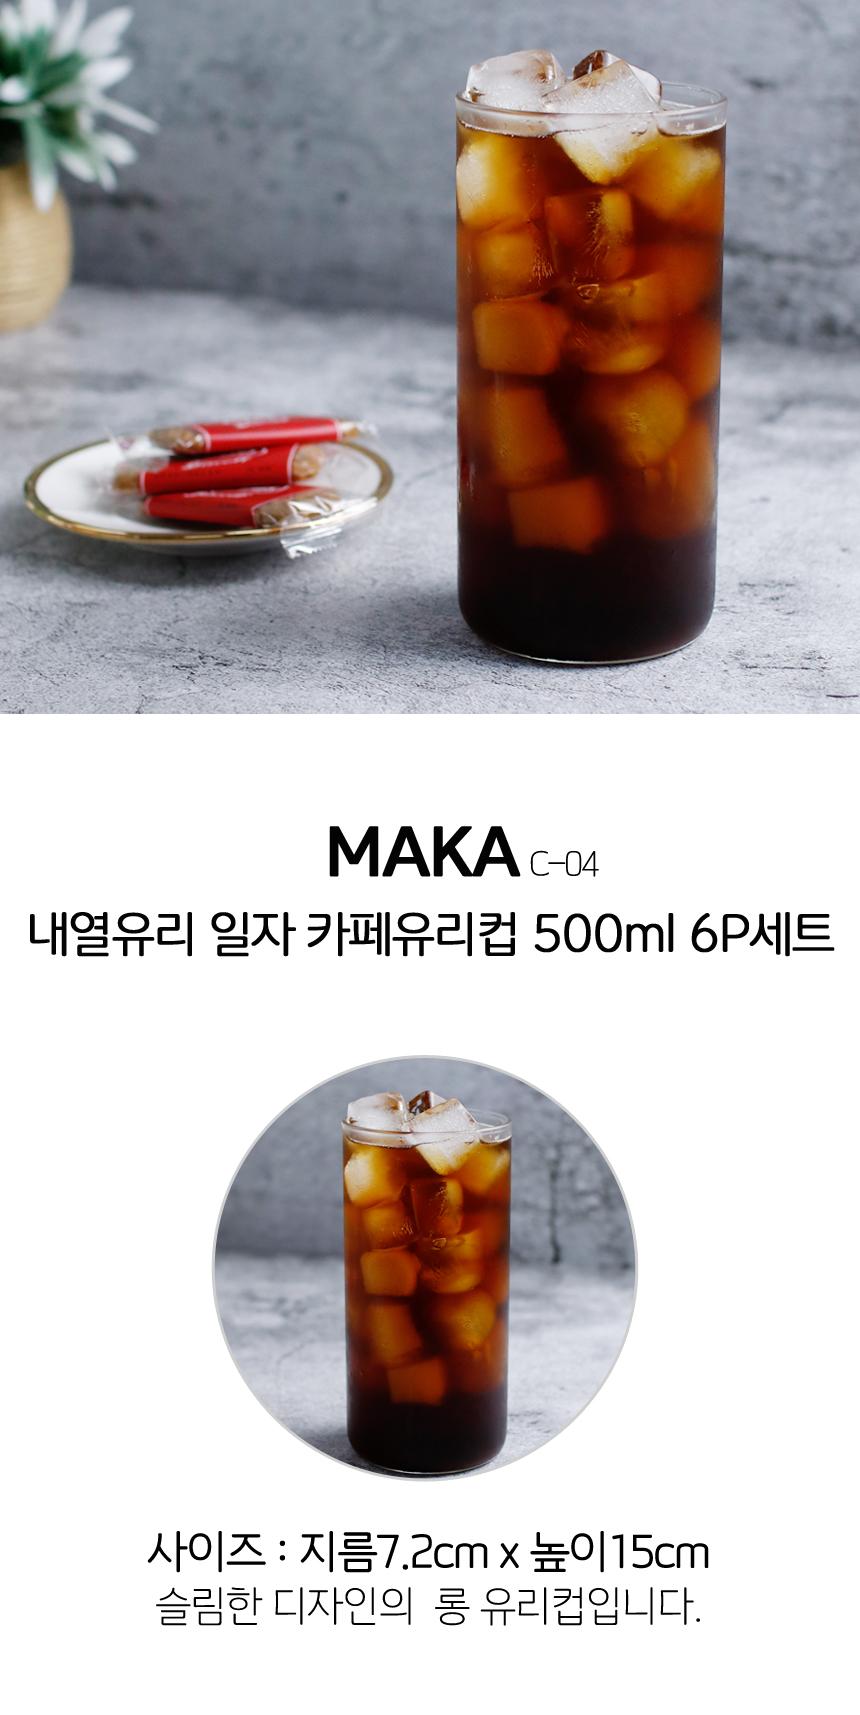 MAKA 내열유리 카페유리컵 500ml 6P세트(C04) - 김씨하우스, 25,000원, 유리컵/술잔, 유리컵